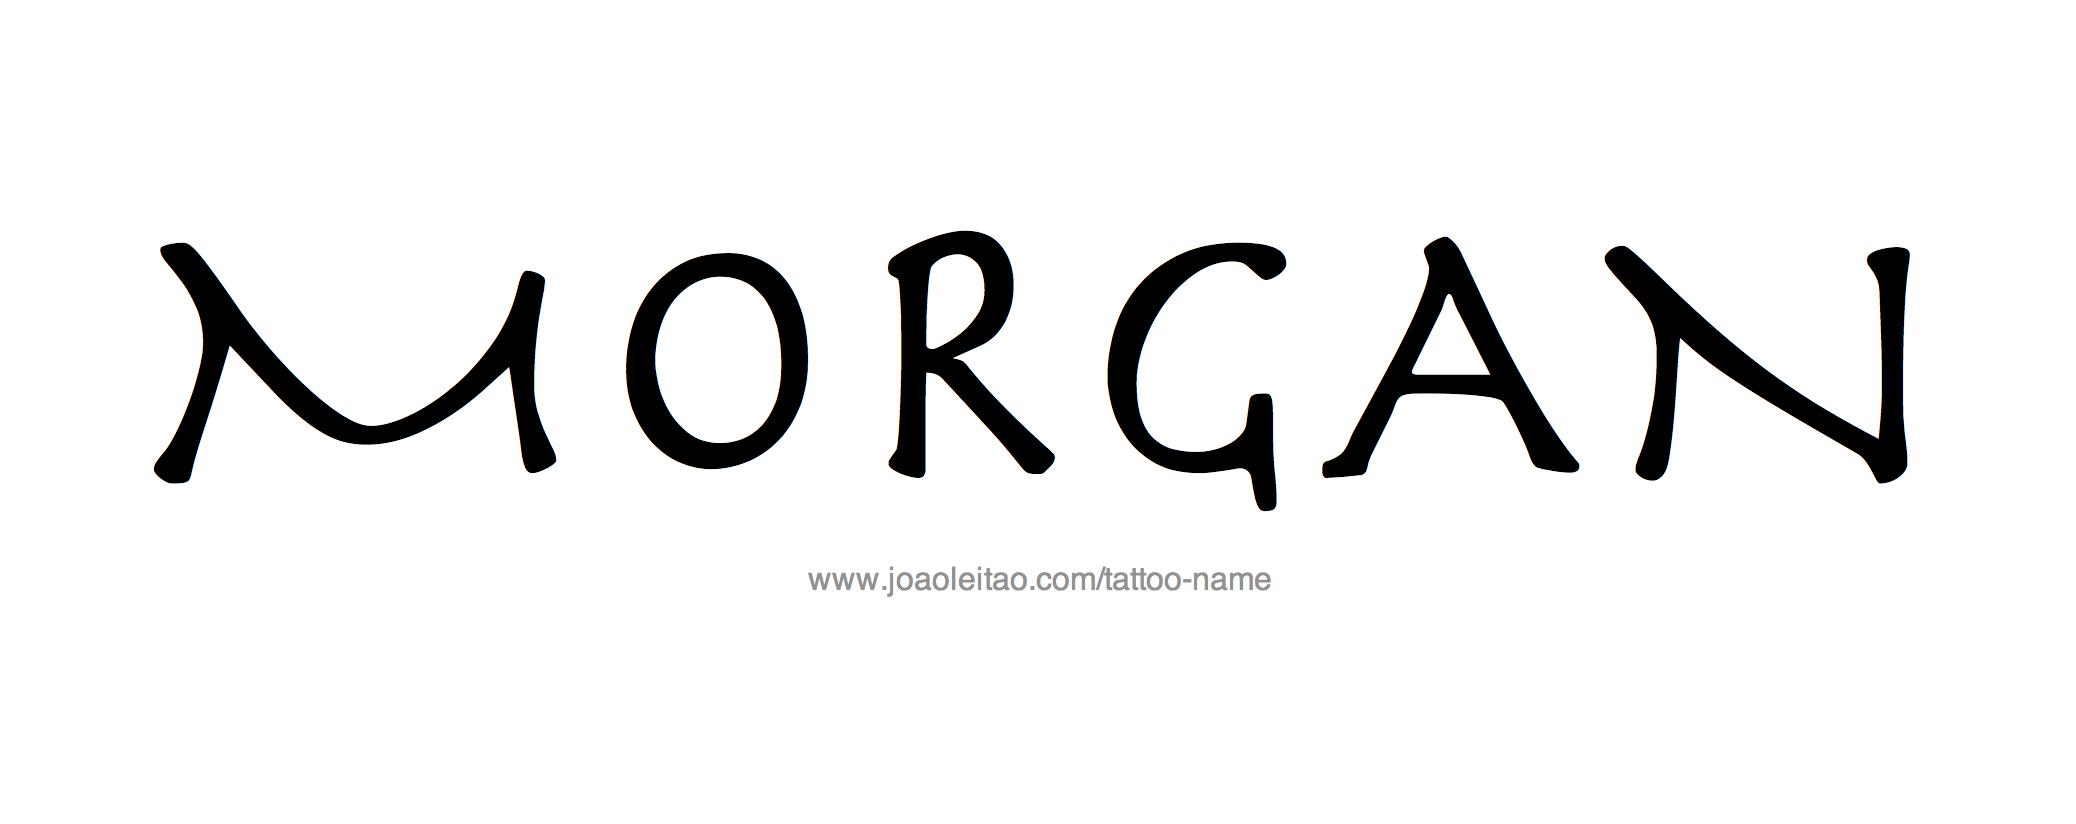 Name: Morgan Name Tattoo Designs